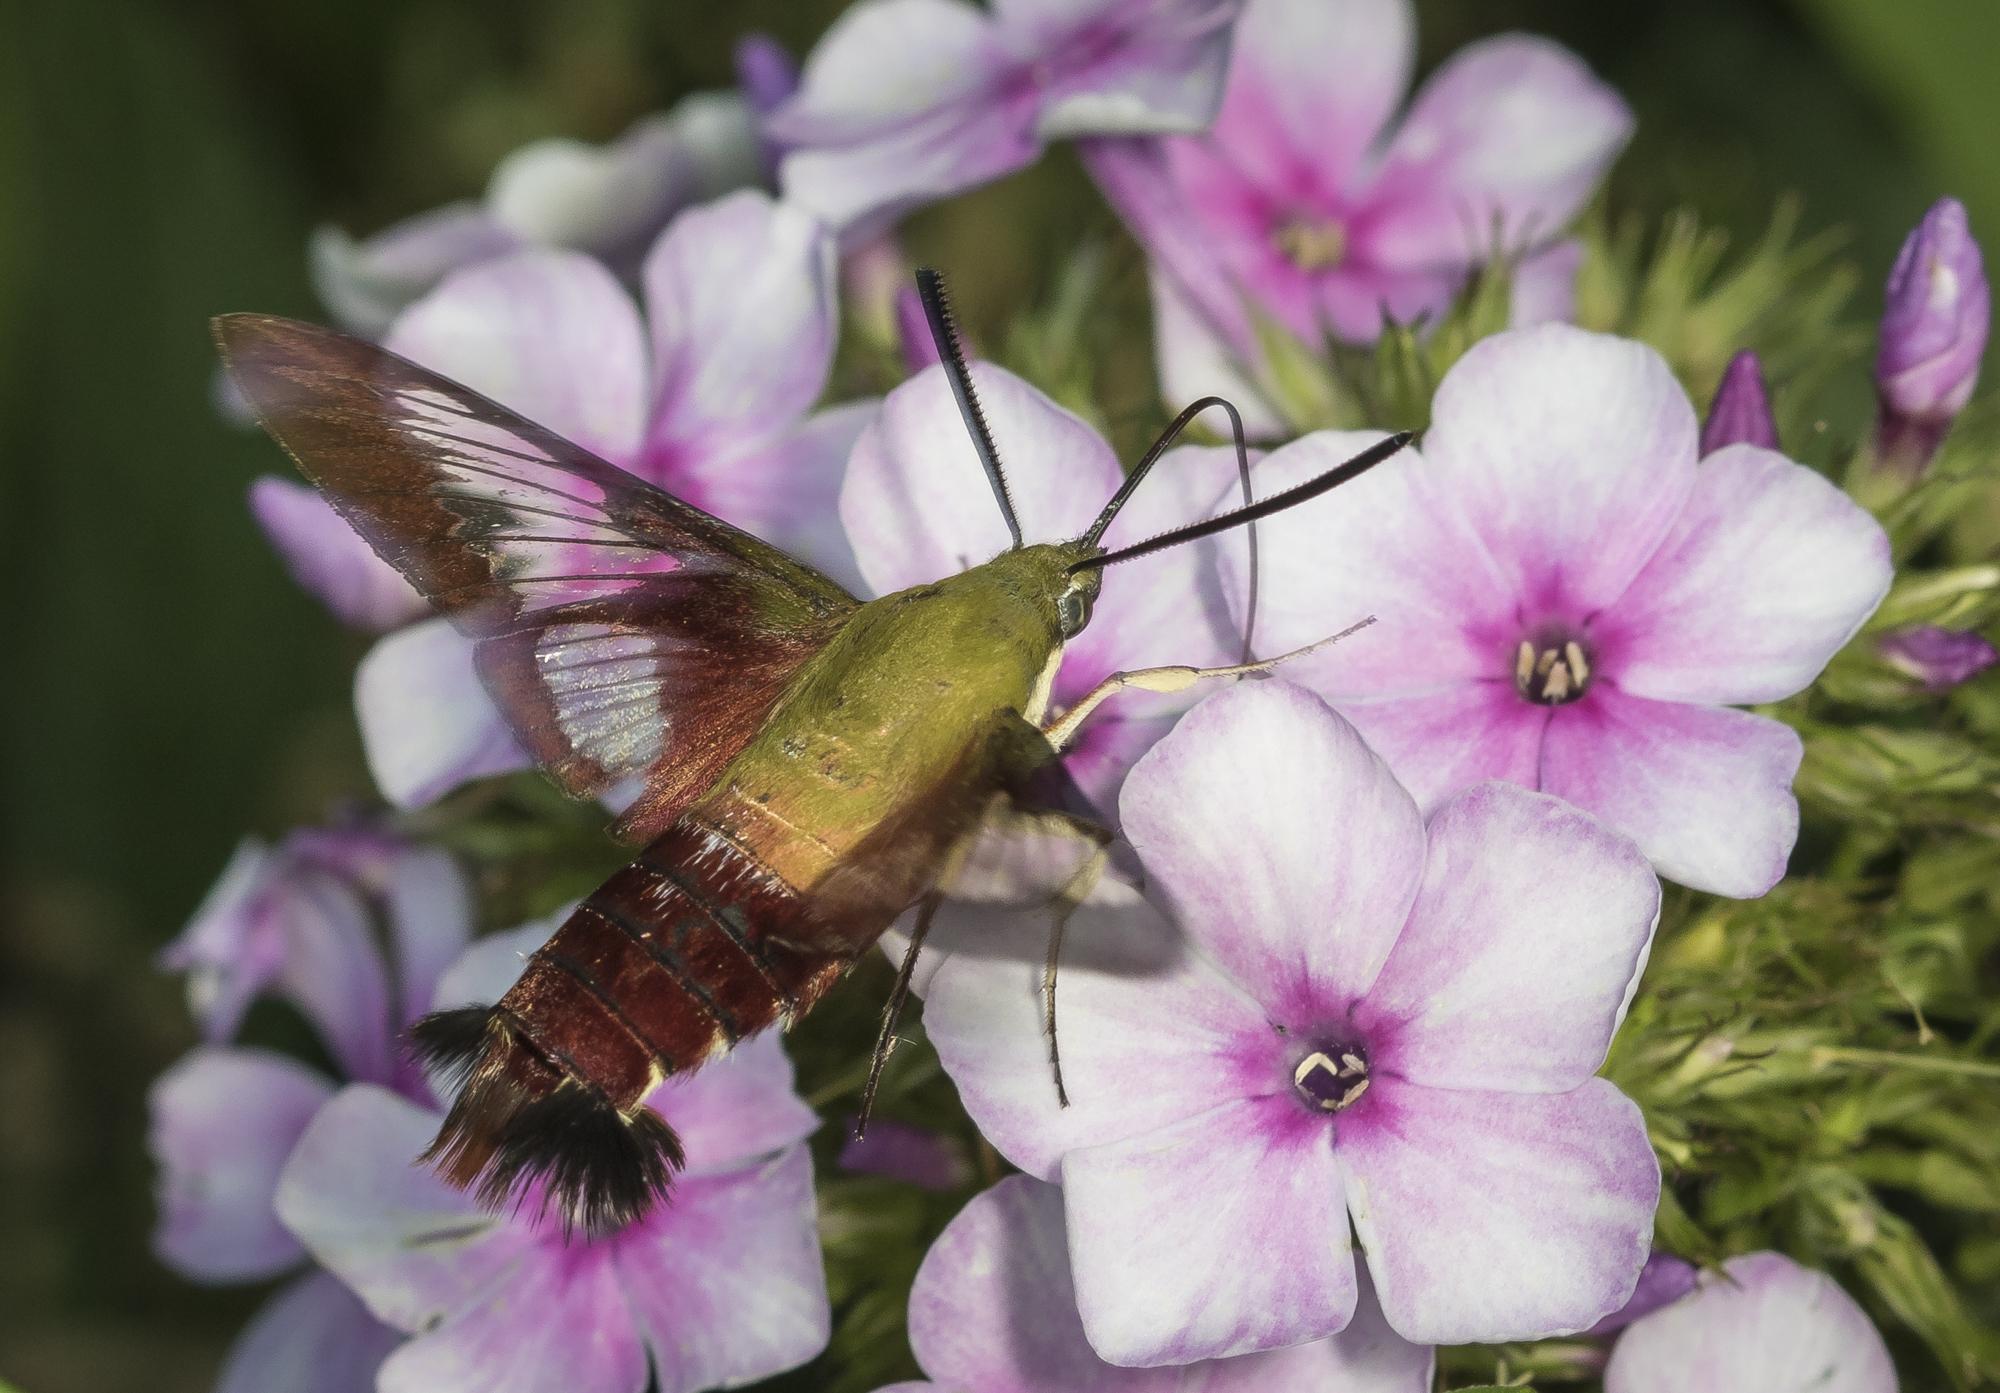 Hummingbird clearwing moth at garden phlox